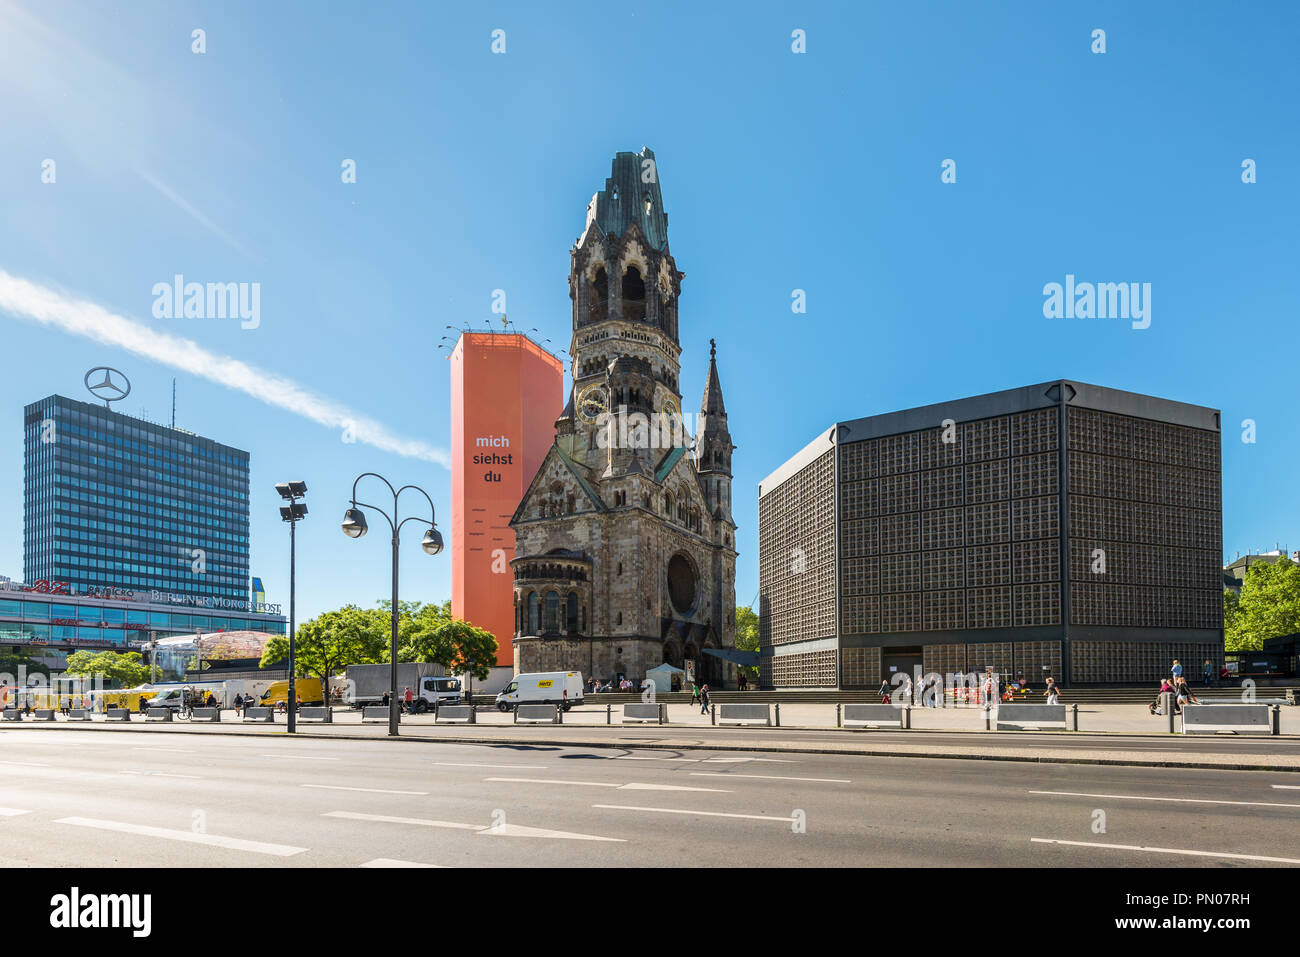 Berlin Germany May27 2017 Kaiser Wilhelm Kirche Broken Spire